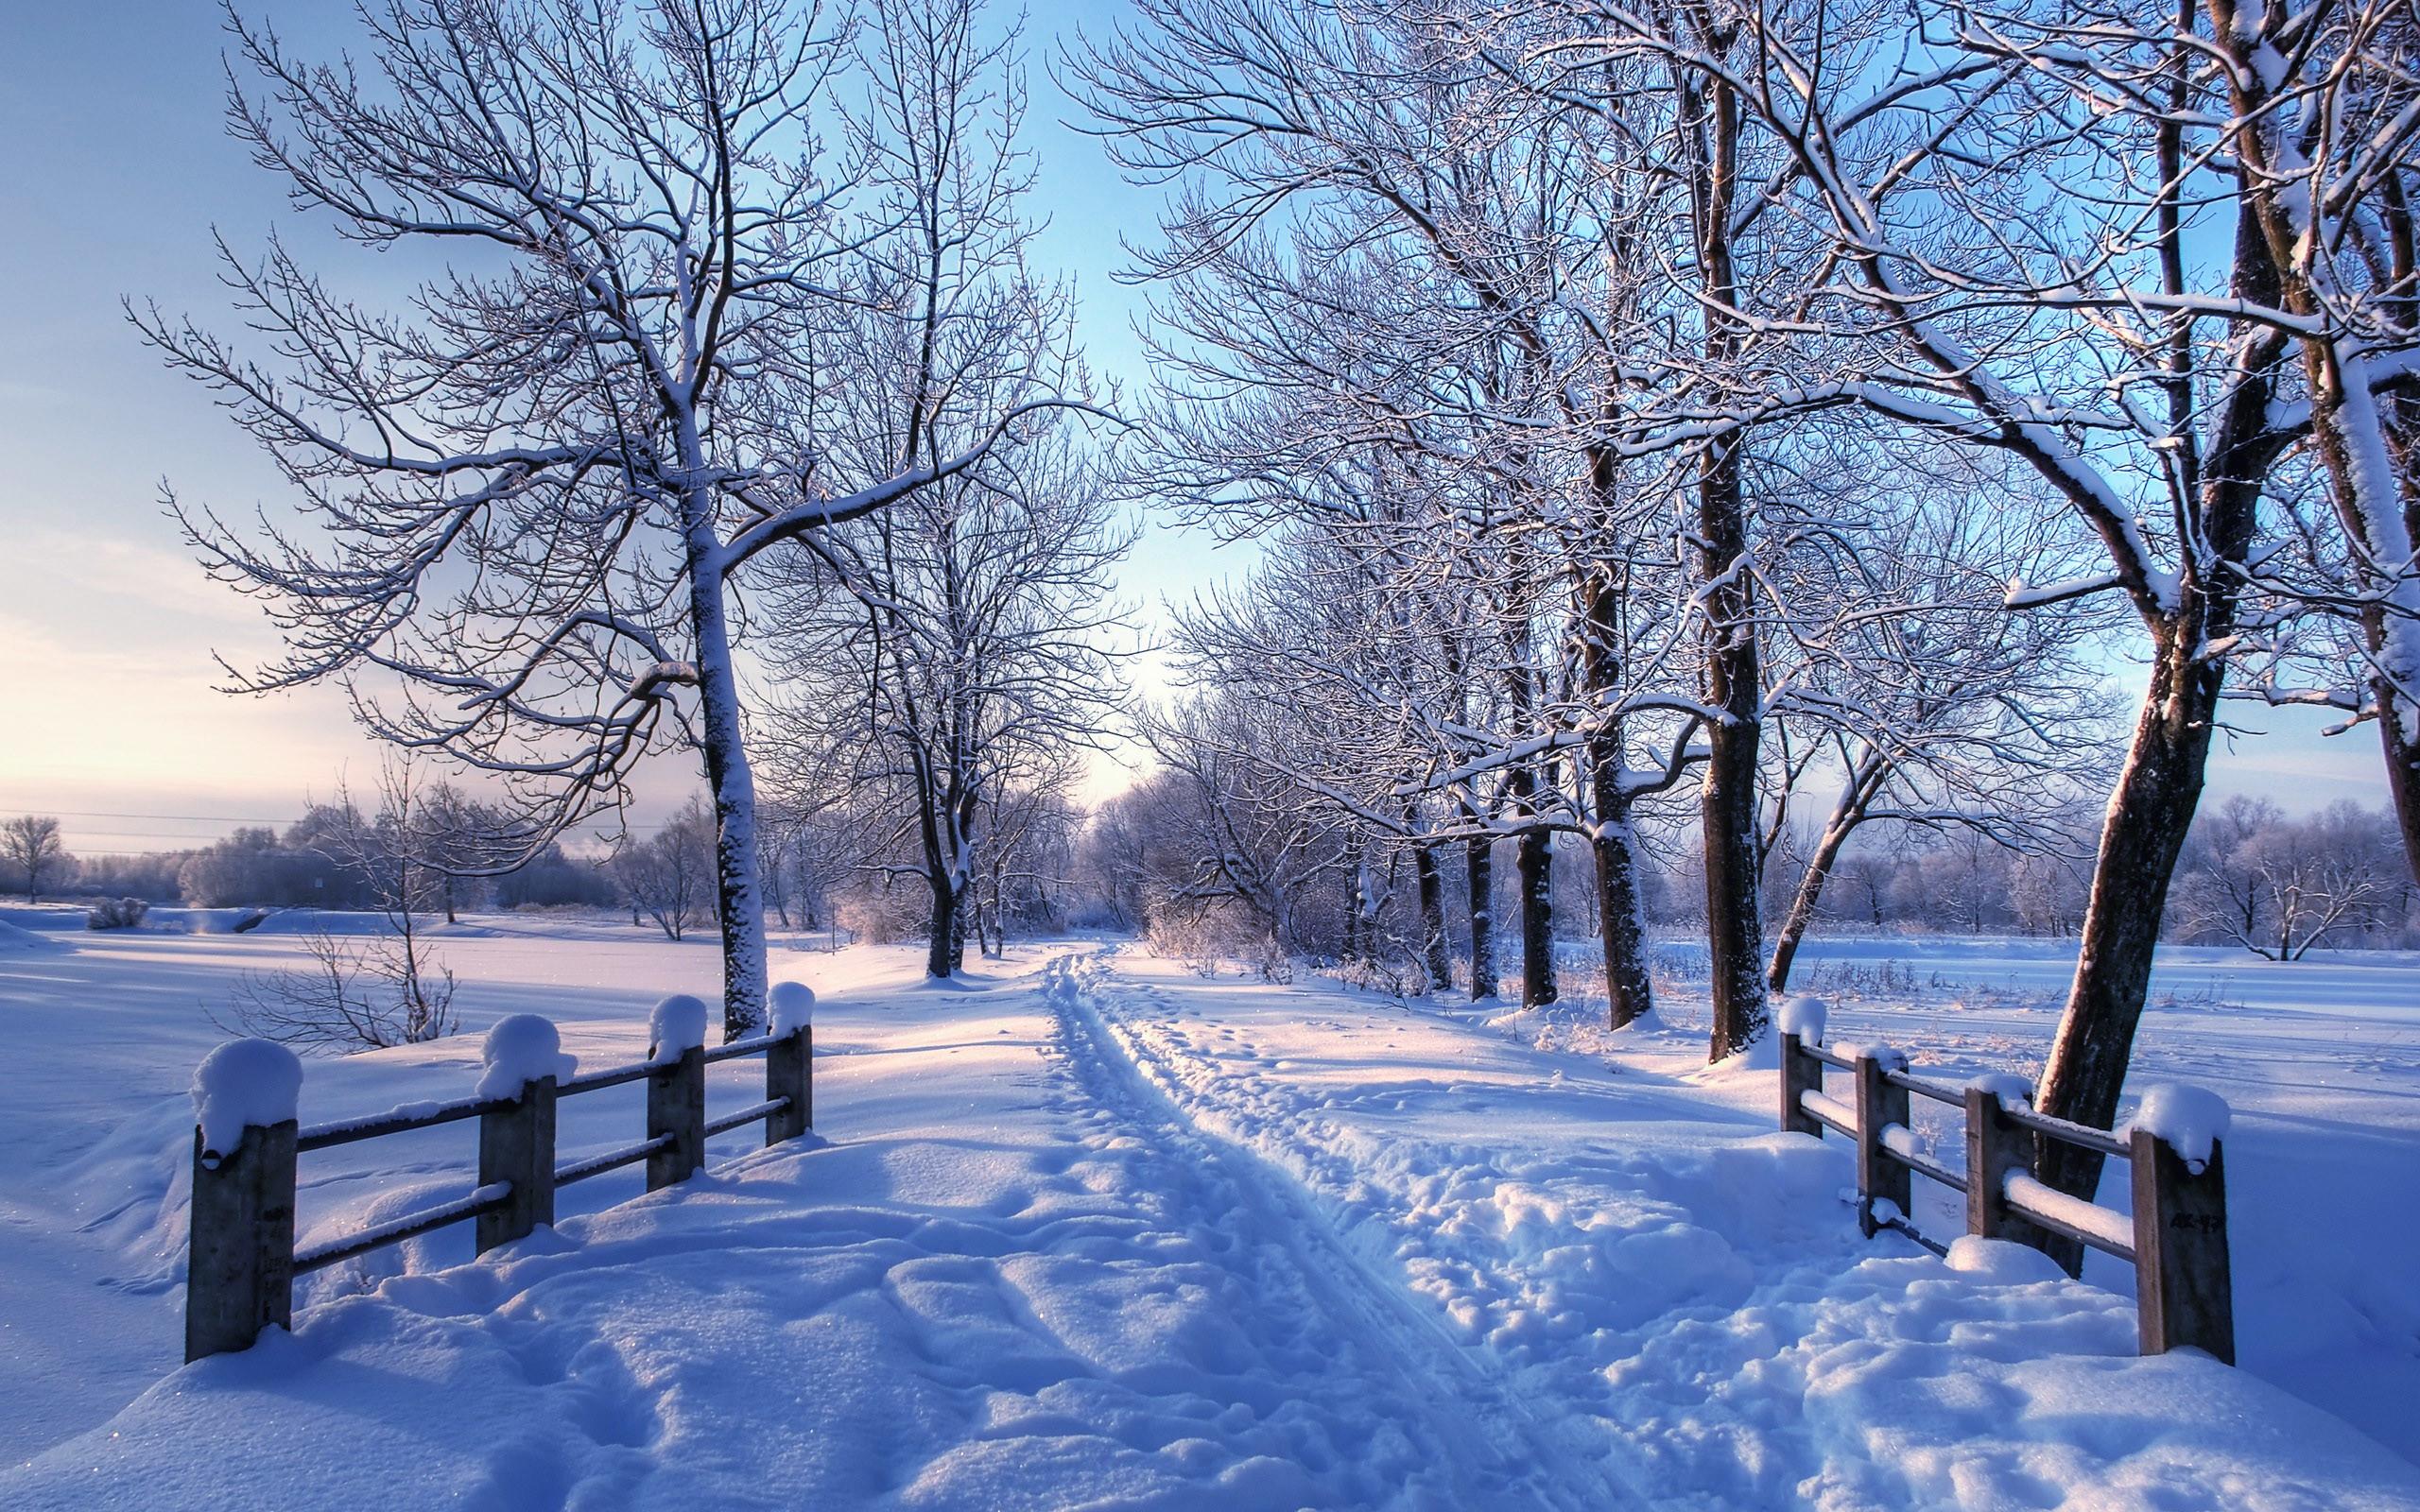 Winter Pictures for Desktop Background (69+ images)